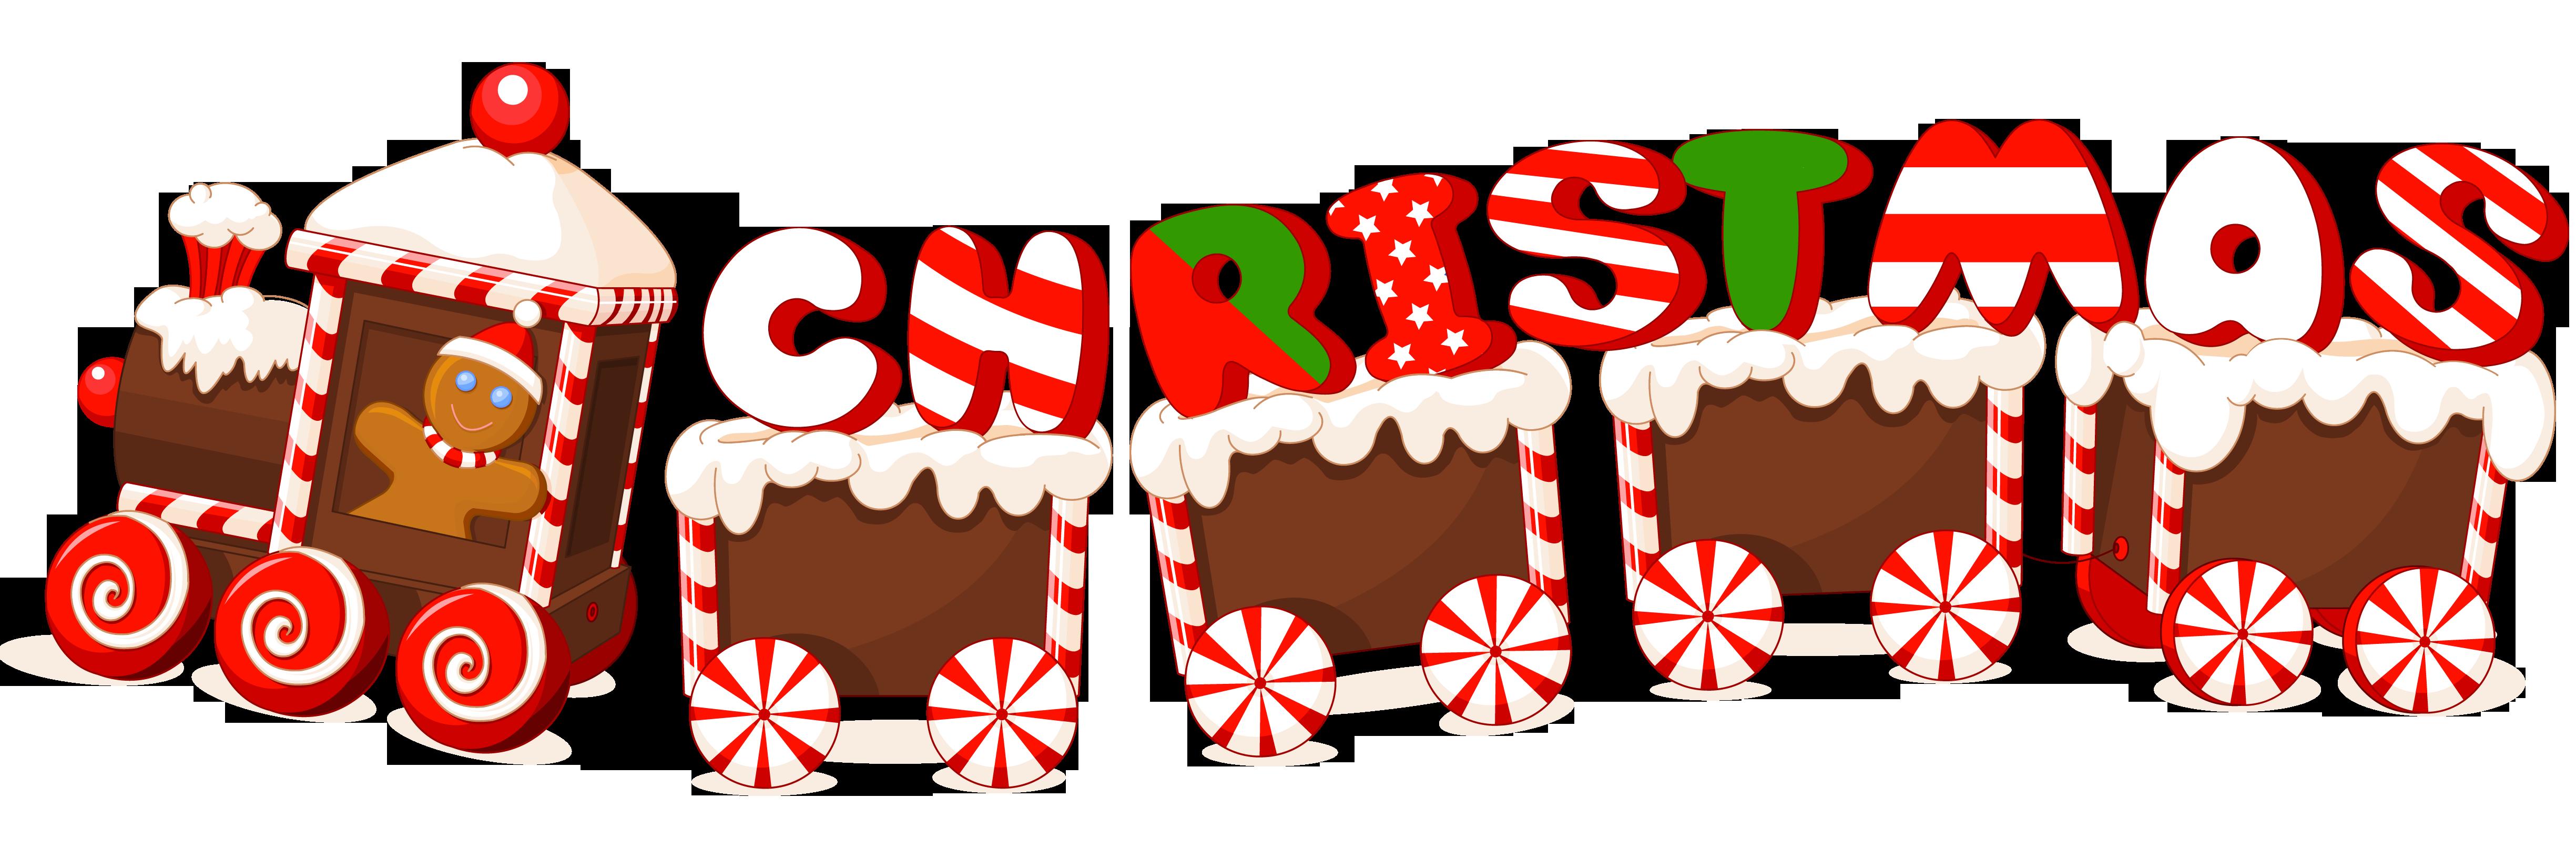 Free Merry Christmas Greetings Clip Art   Usaallfestivals